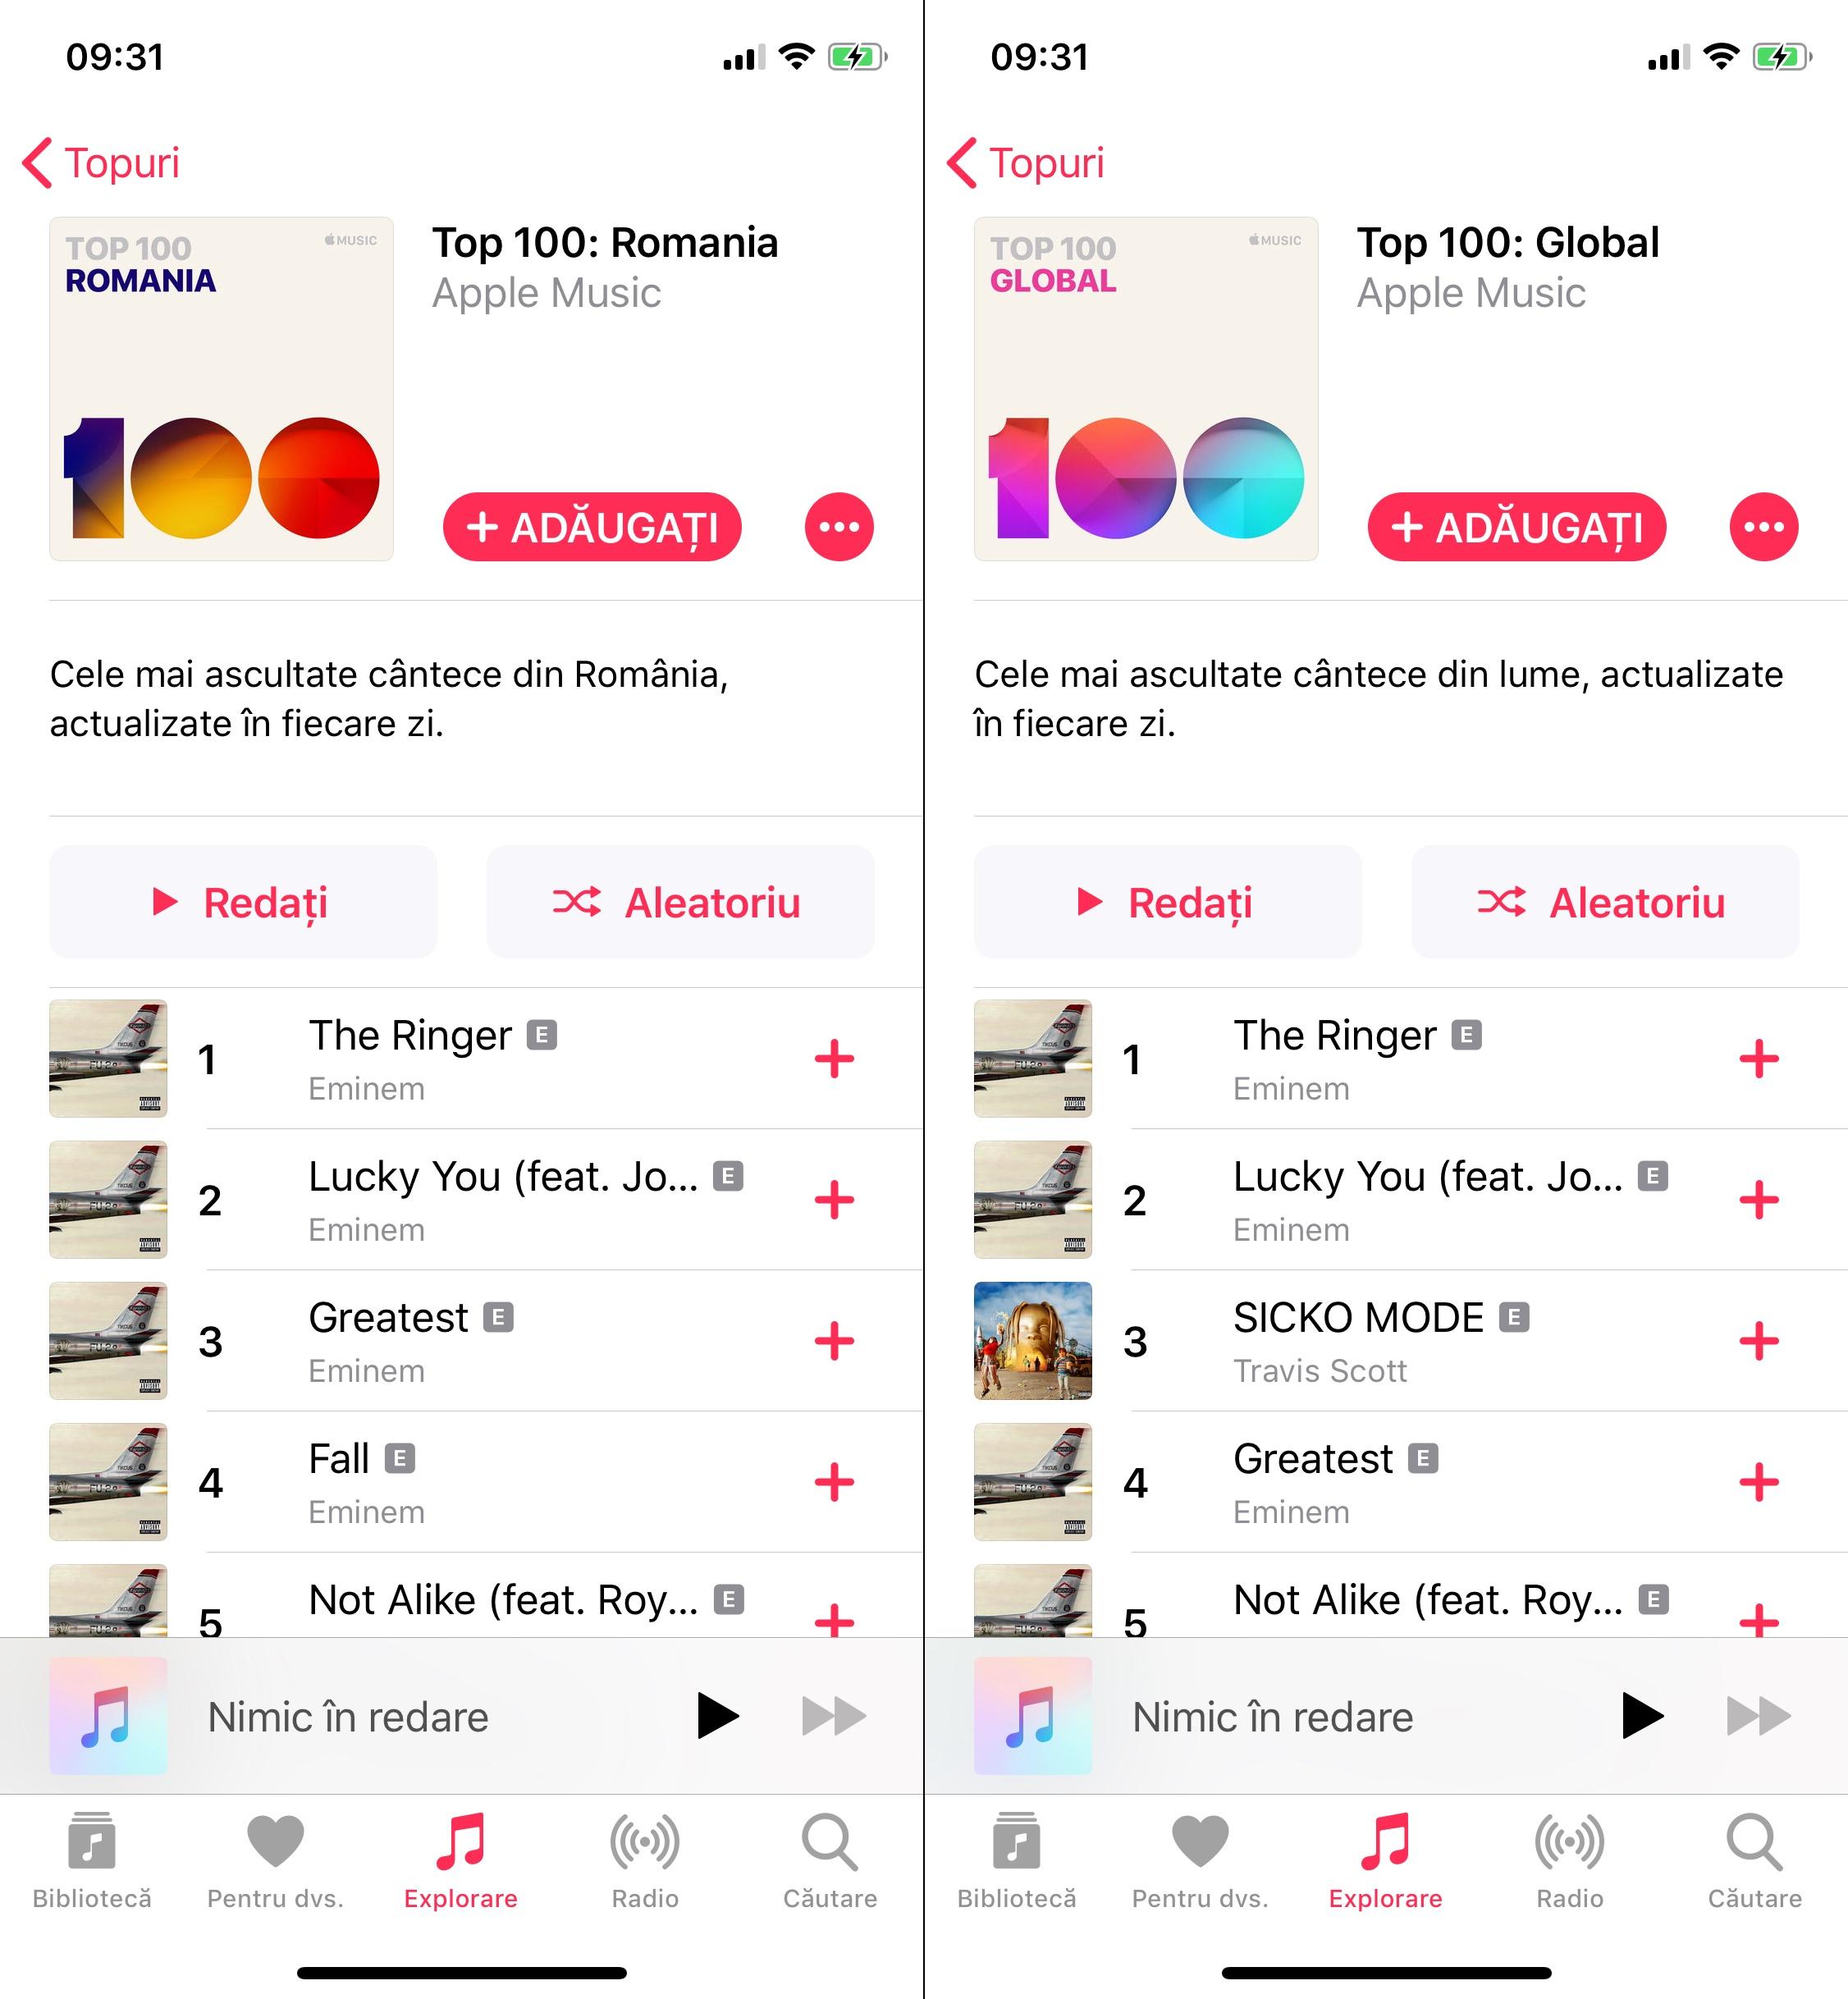 apple music top 100 1